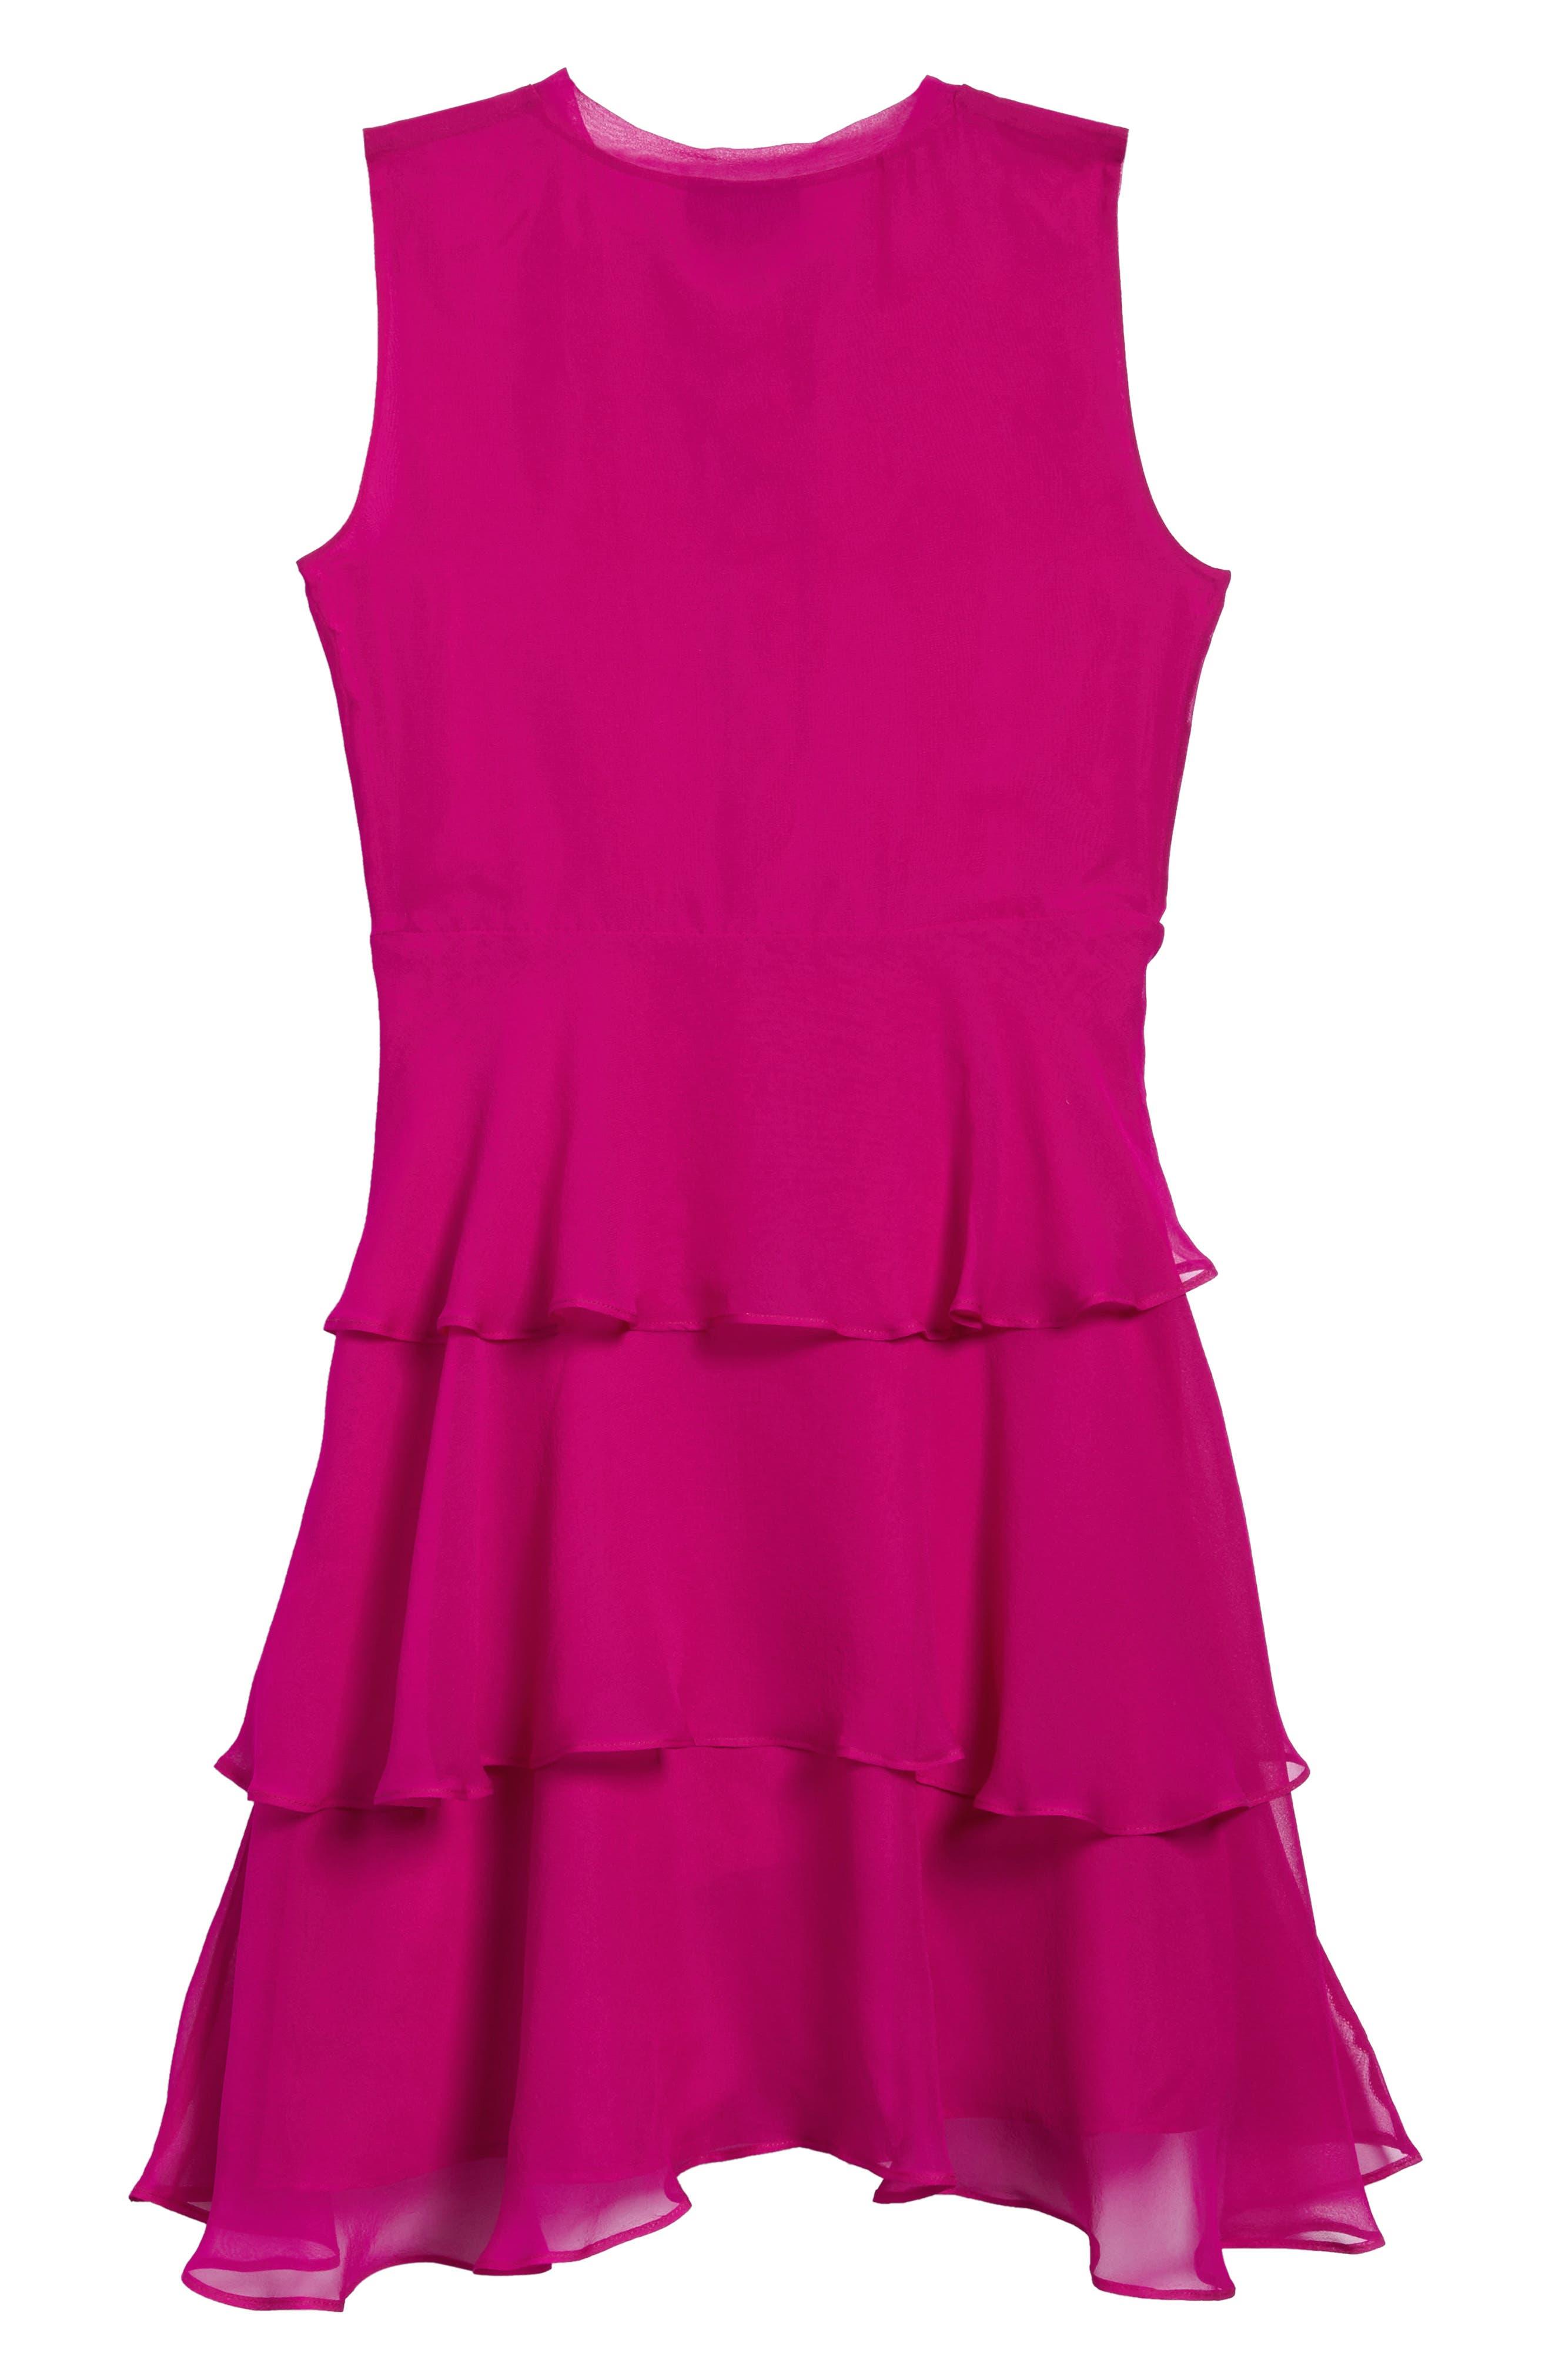 Tiered Silk Chiffon Dress,                             Alternate thumbnail 2, color,                             Fuchsia